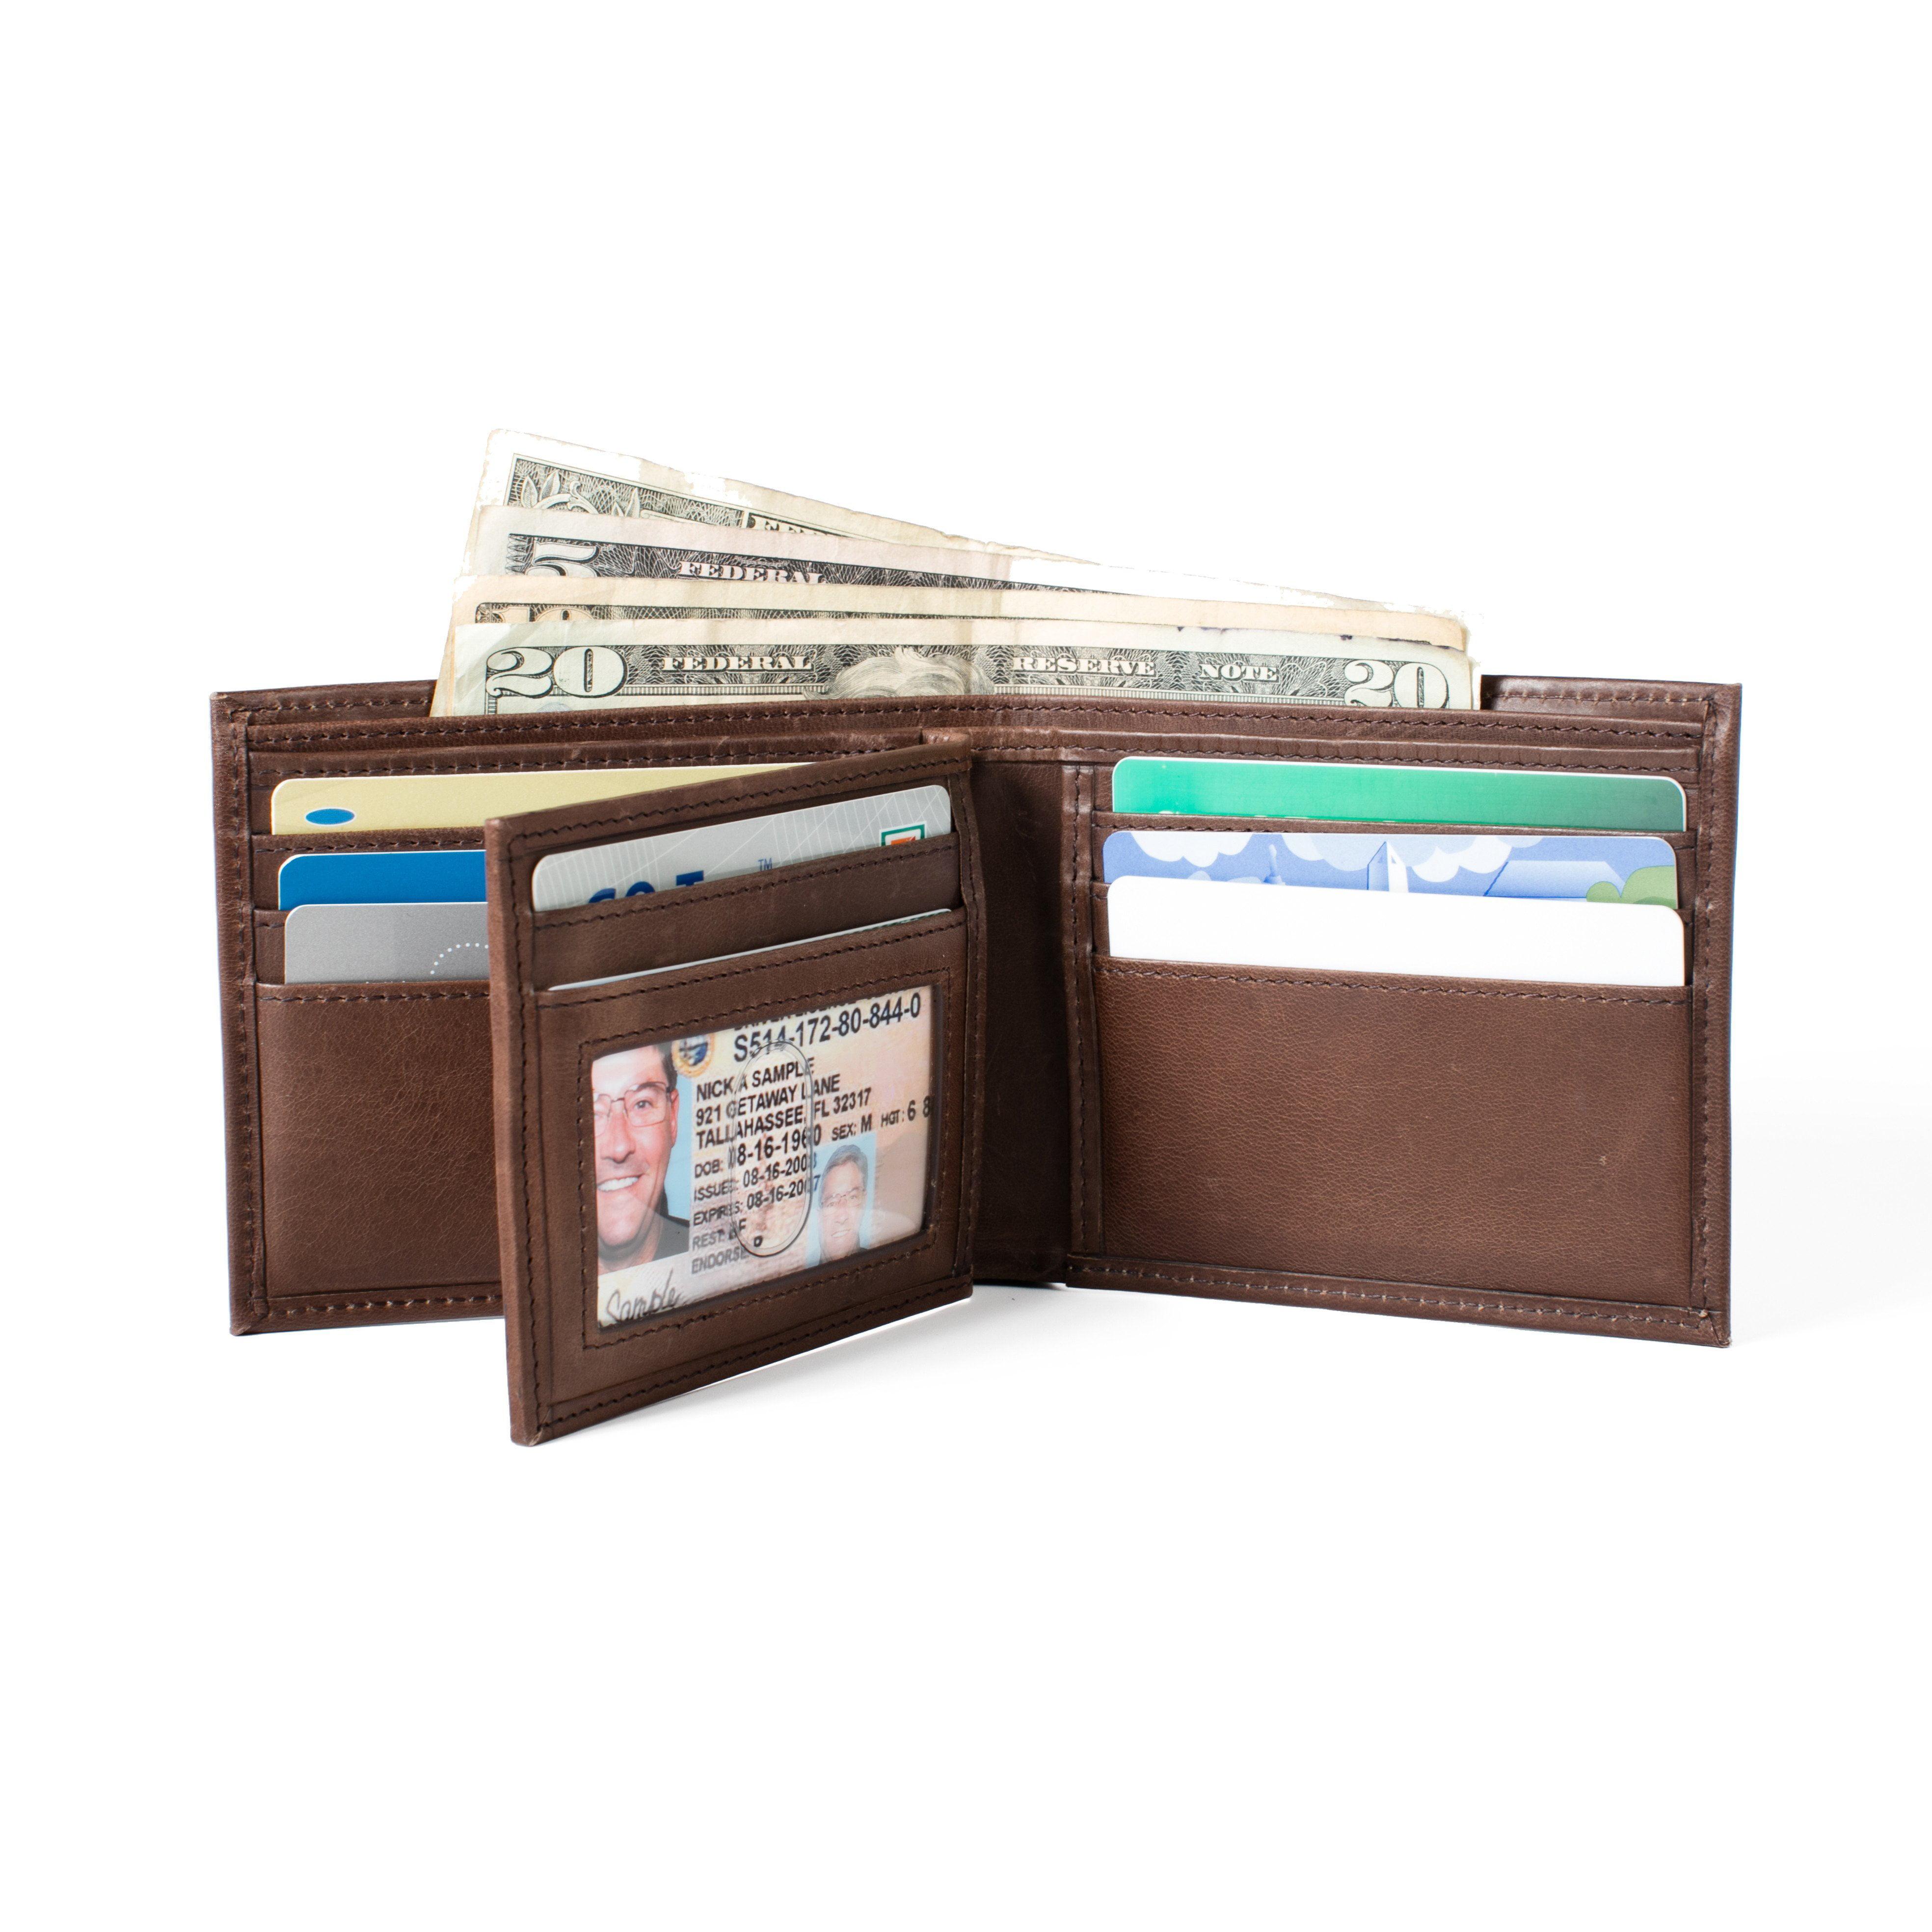 cf86da1edfab ID Stronghold - RFID Wallet in Genuine Leather Bifold 10 Slot ...